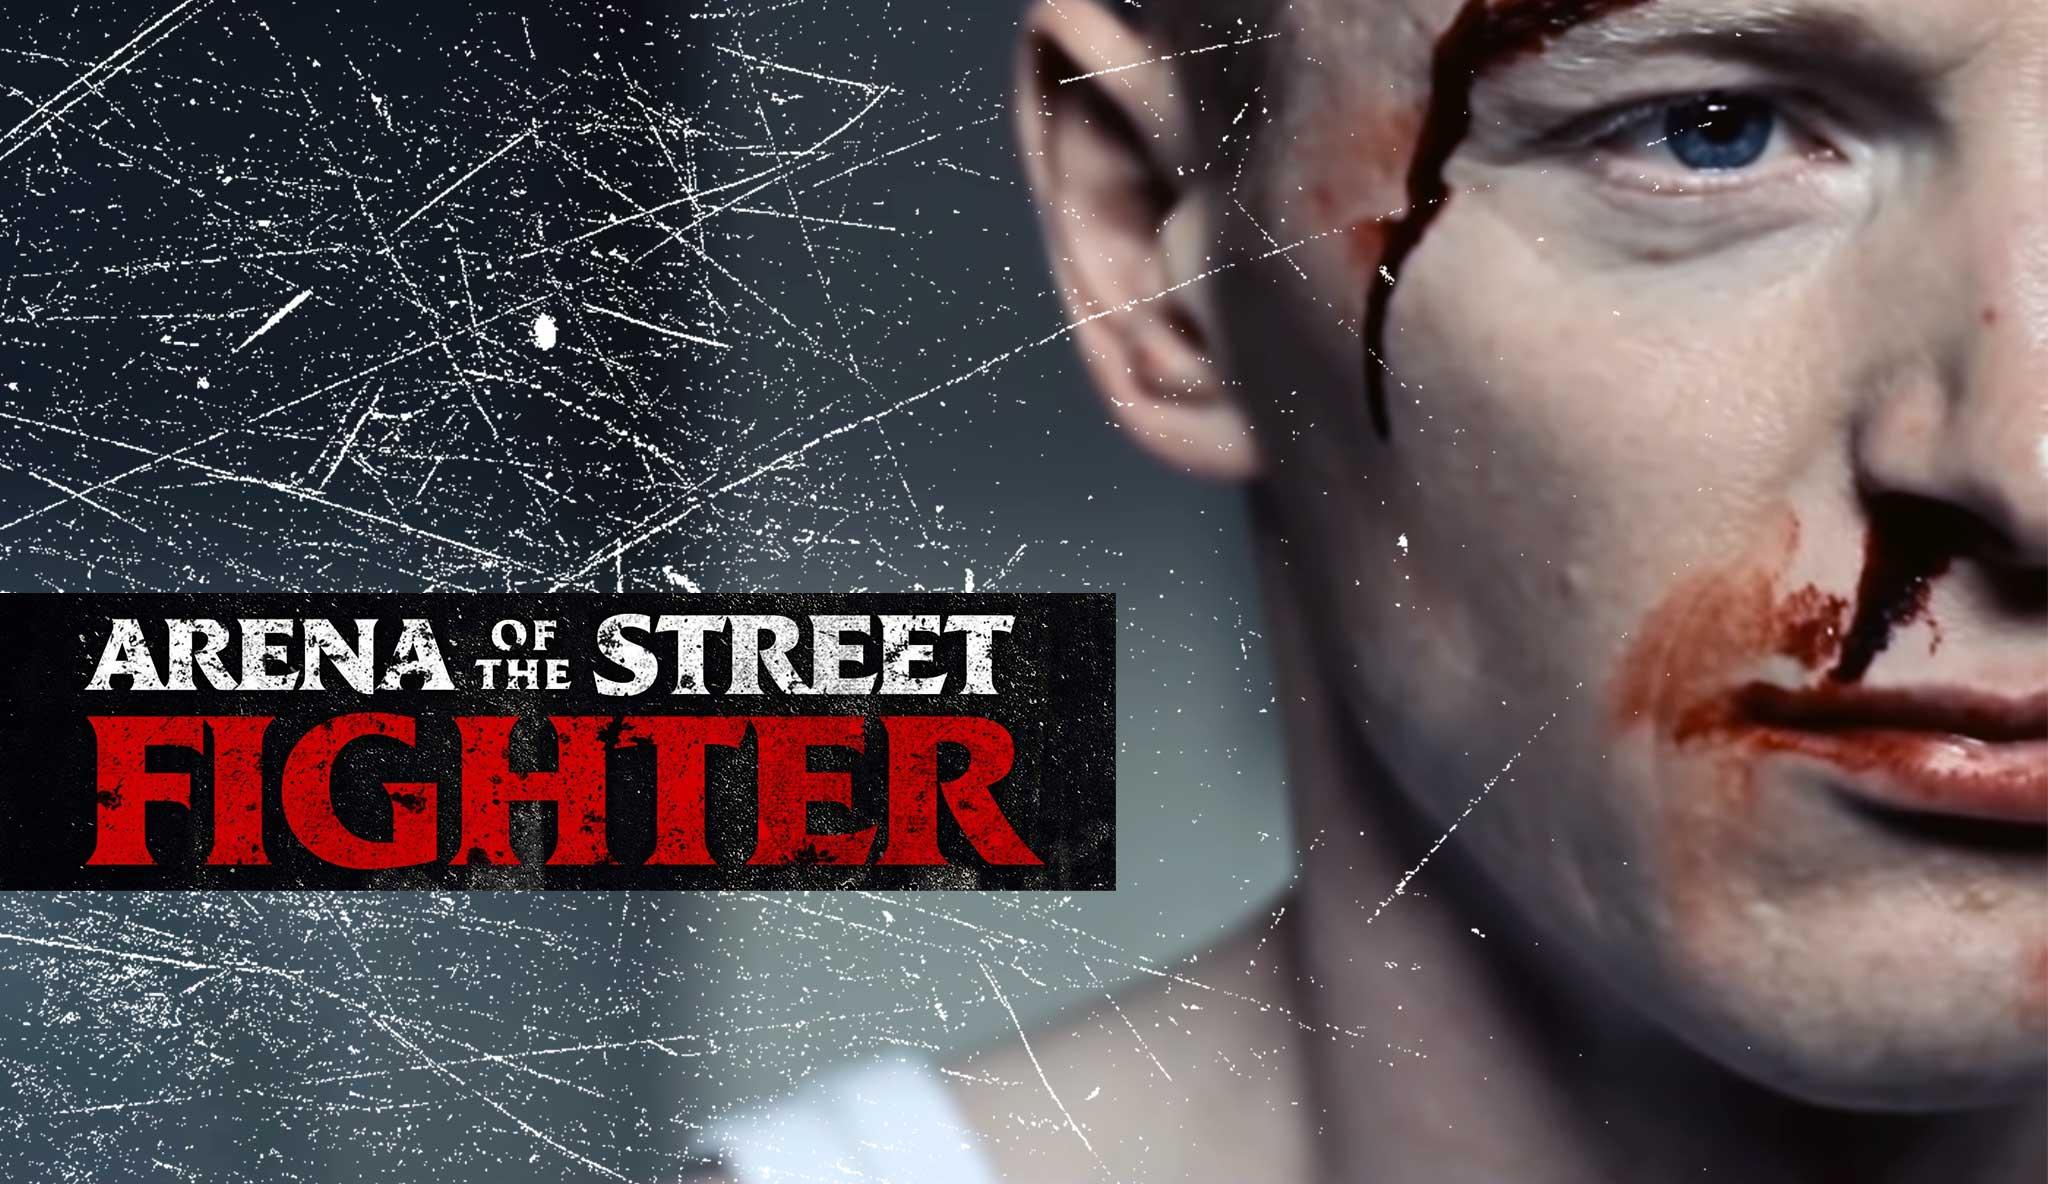 arena-of-the-street-fighter\header.jpg